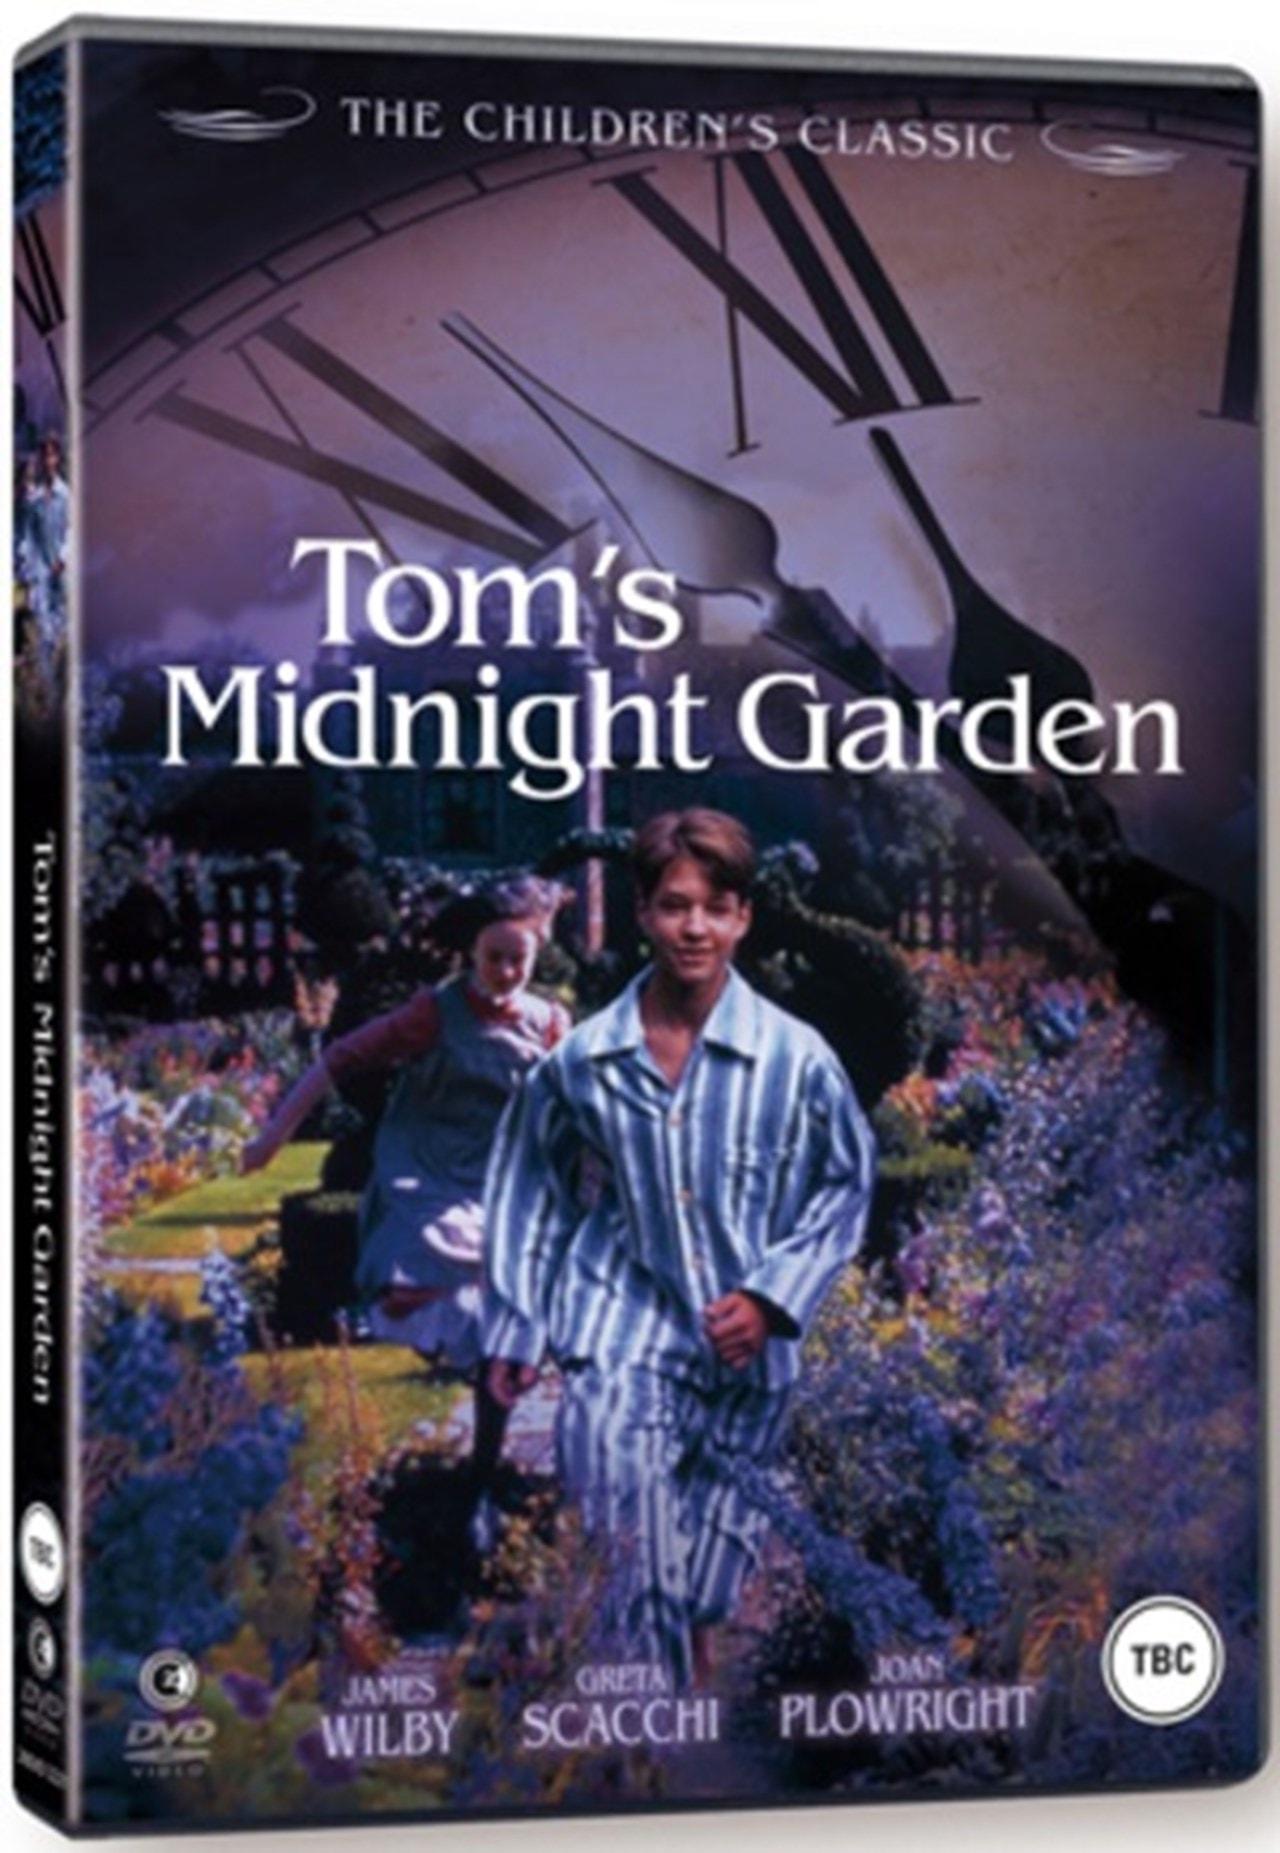 Tom's Midnight Garden - 1